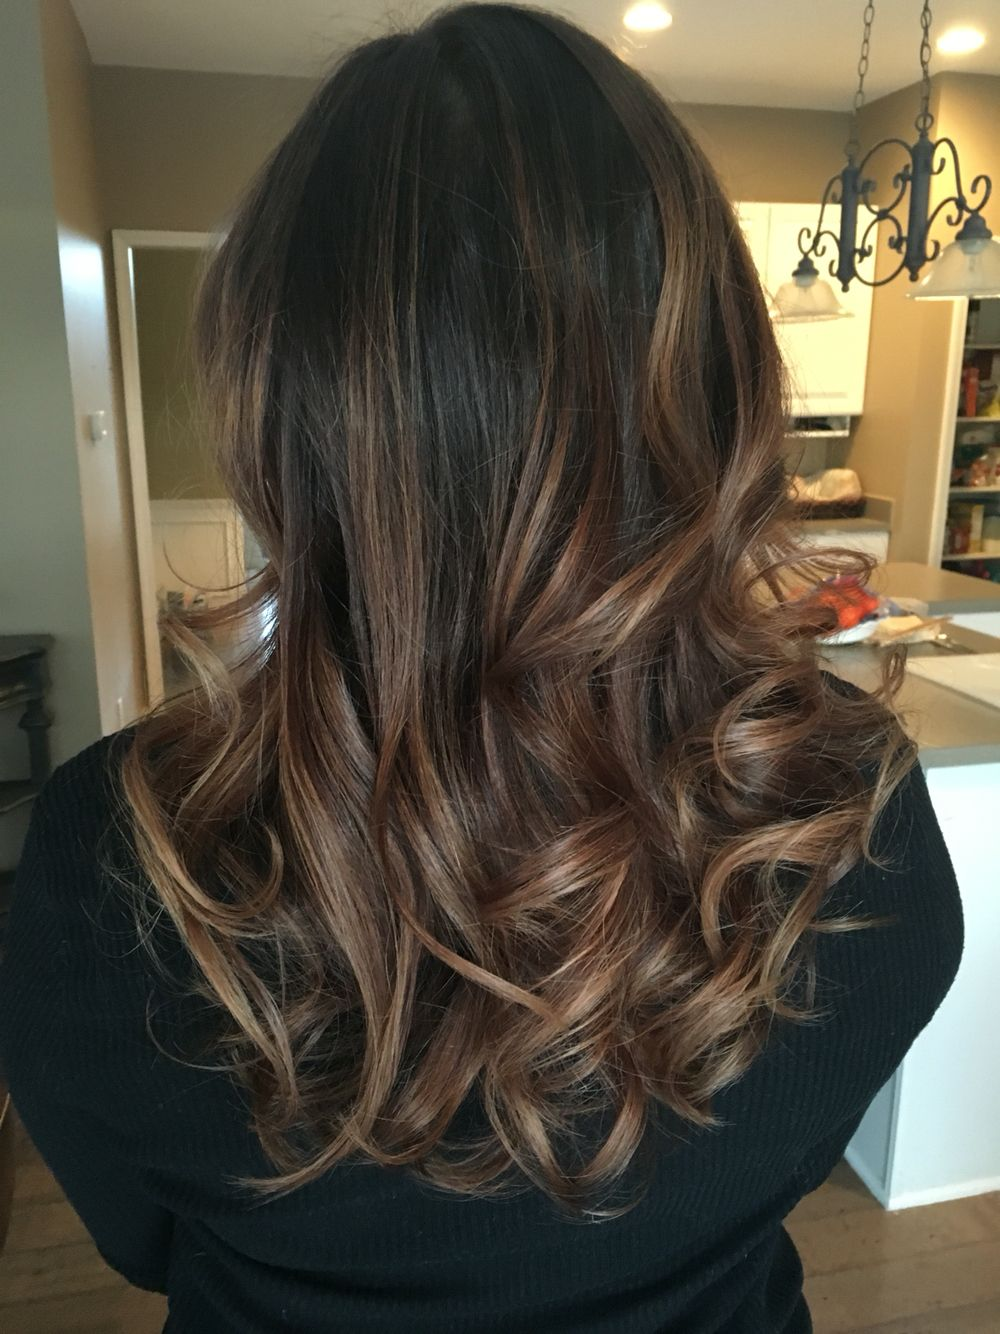 Balayage medium brown , Thank you Salon Bliss!